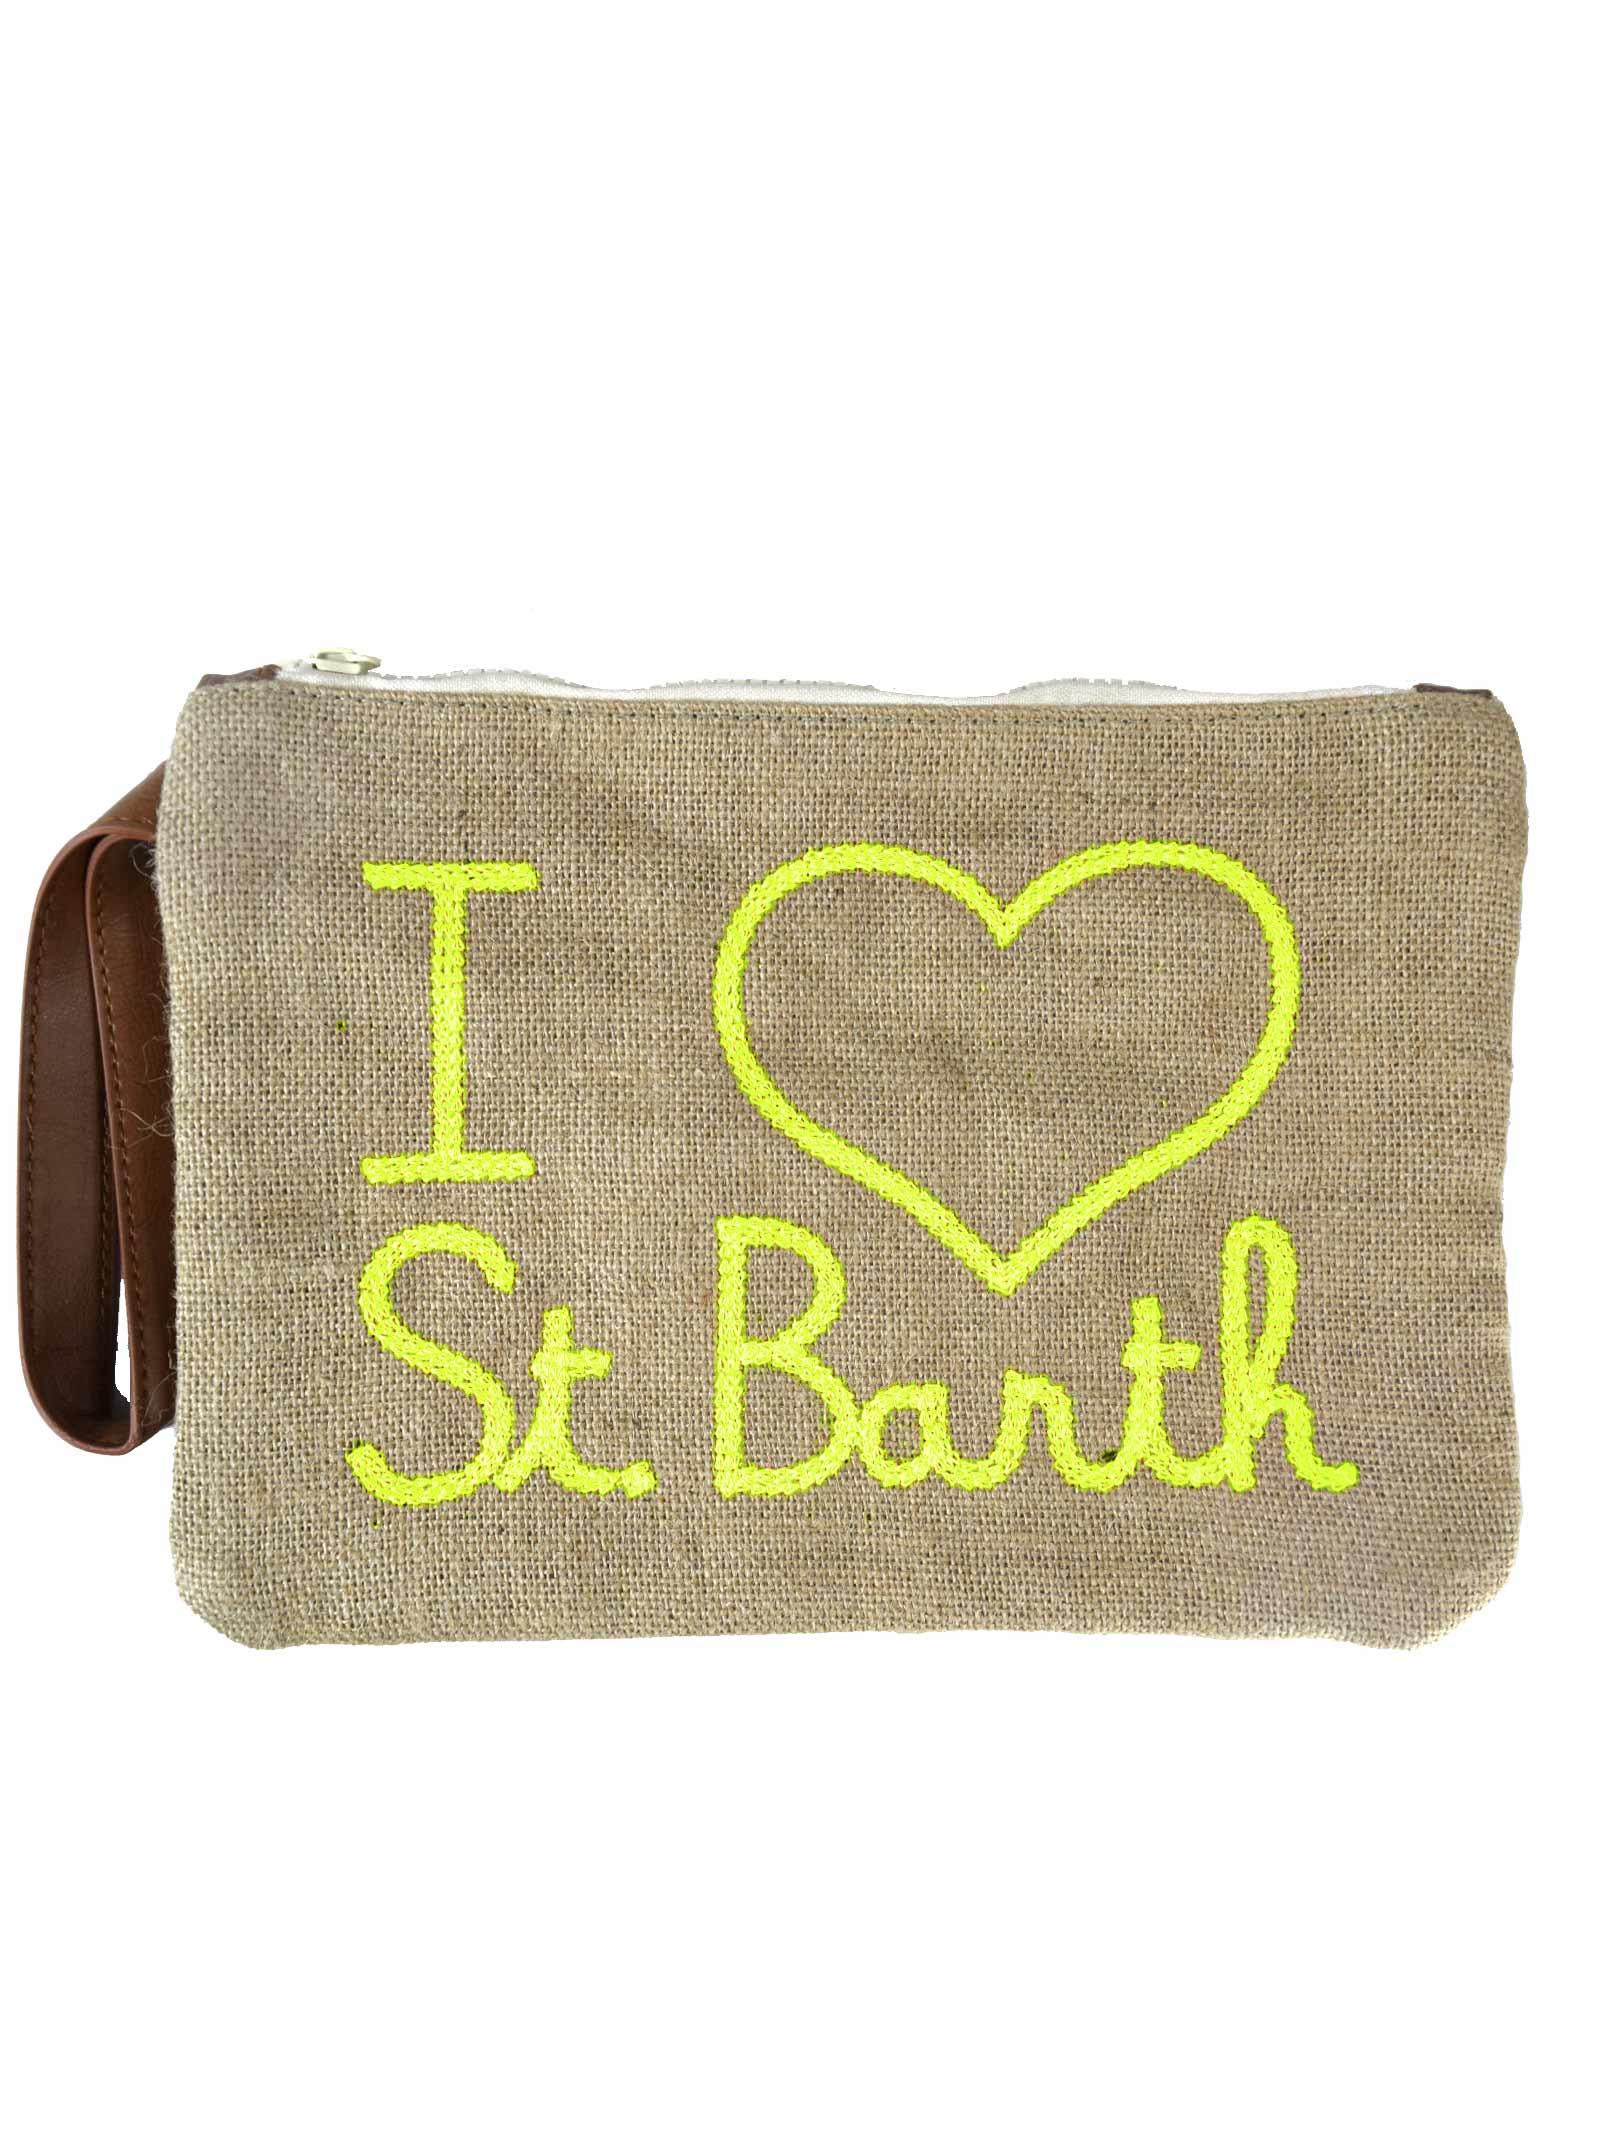 pochette MC2  SAINT BARTH | Borse | PARISIENNE JUTEELSB19